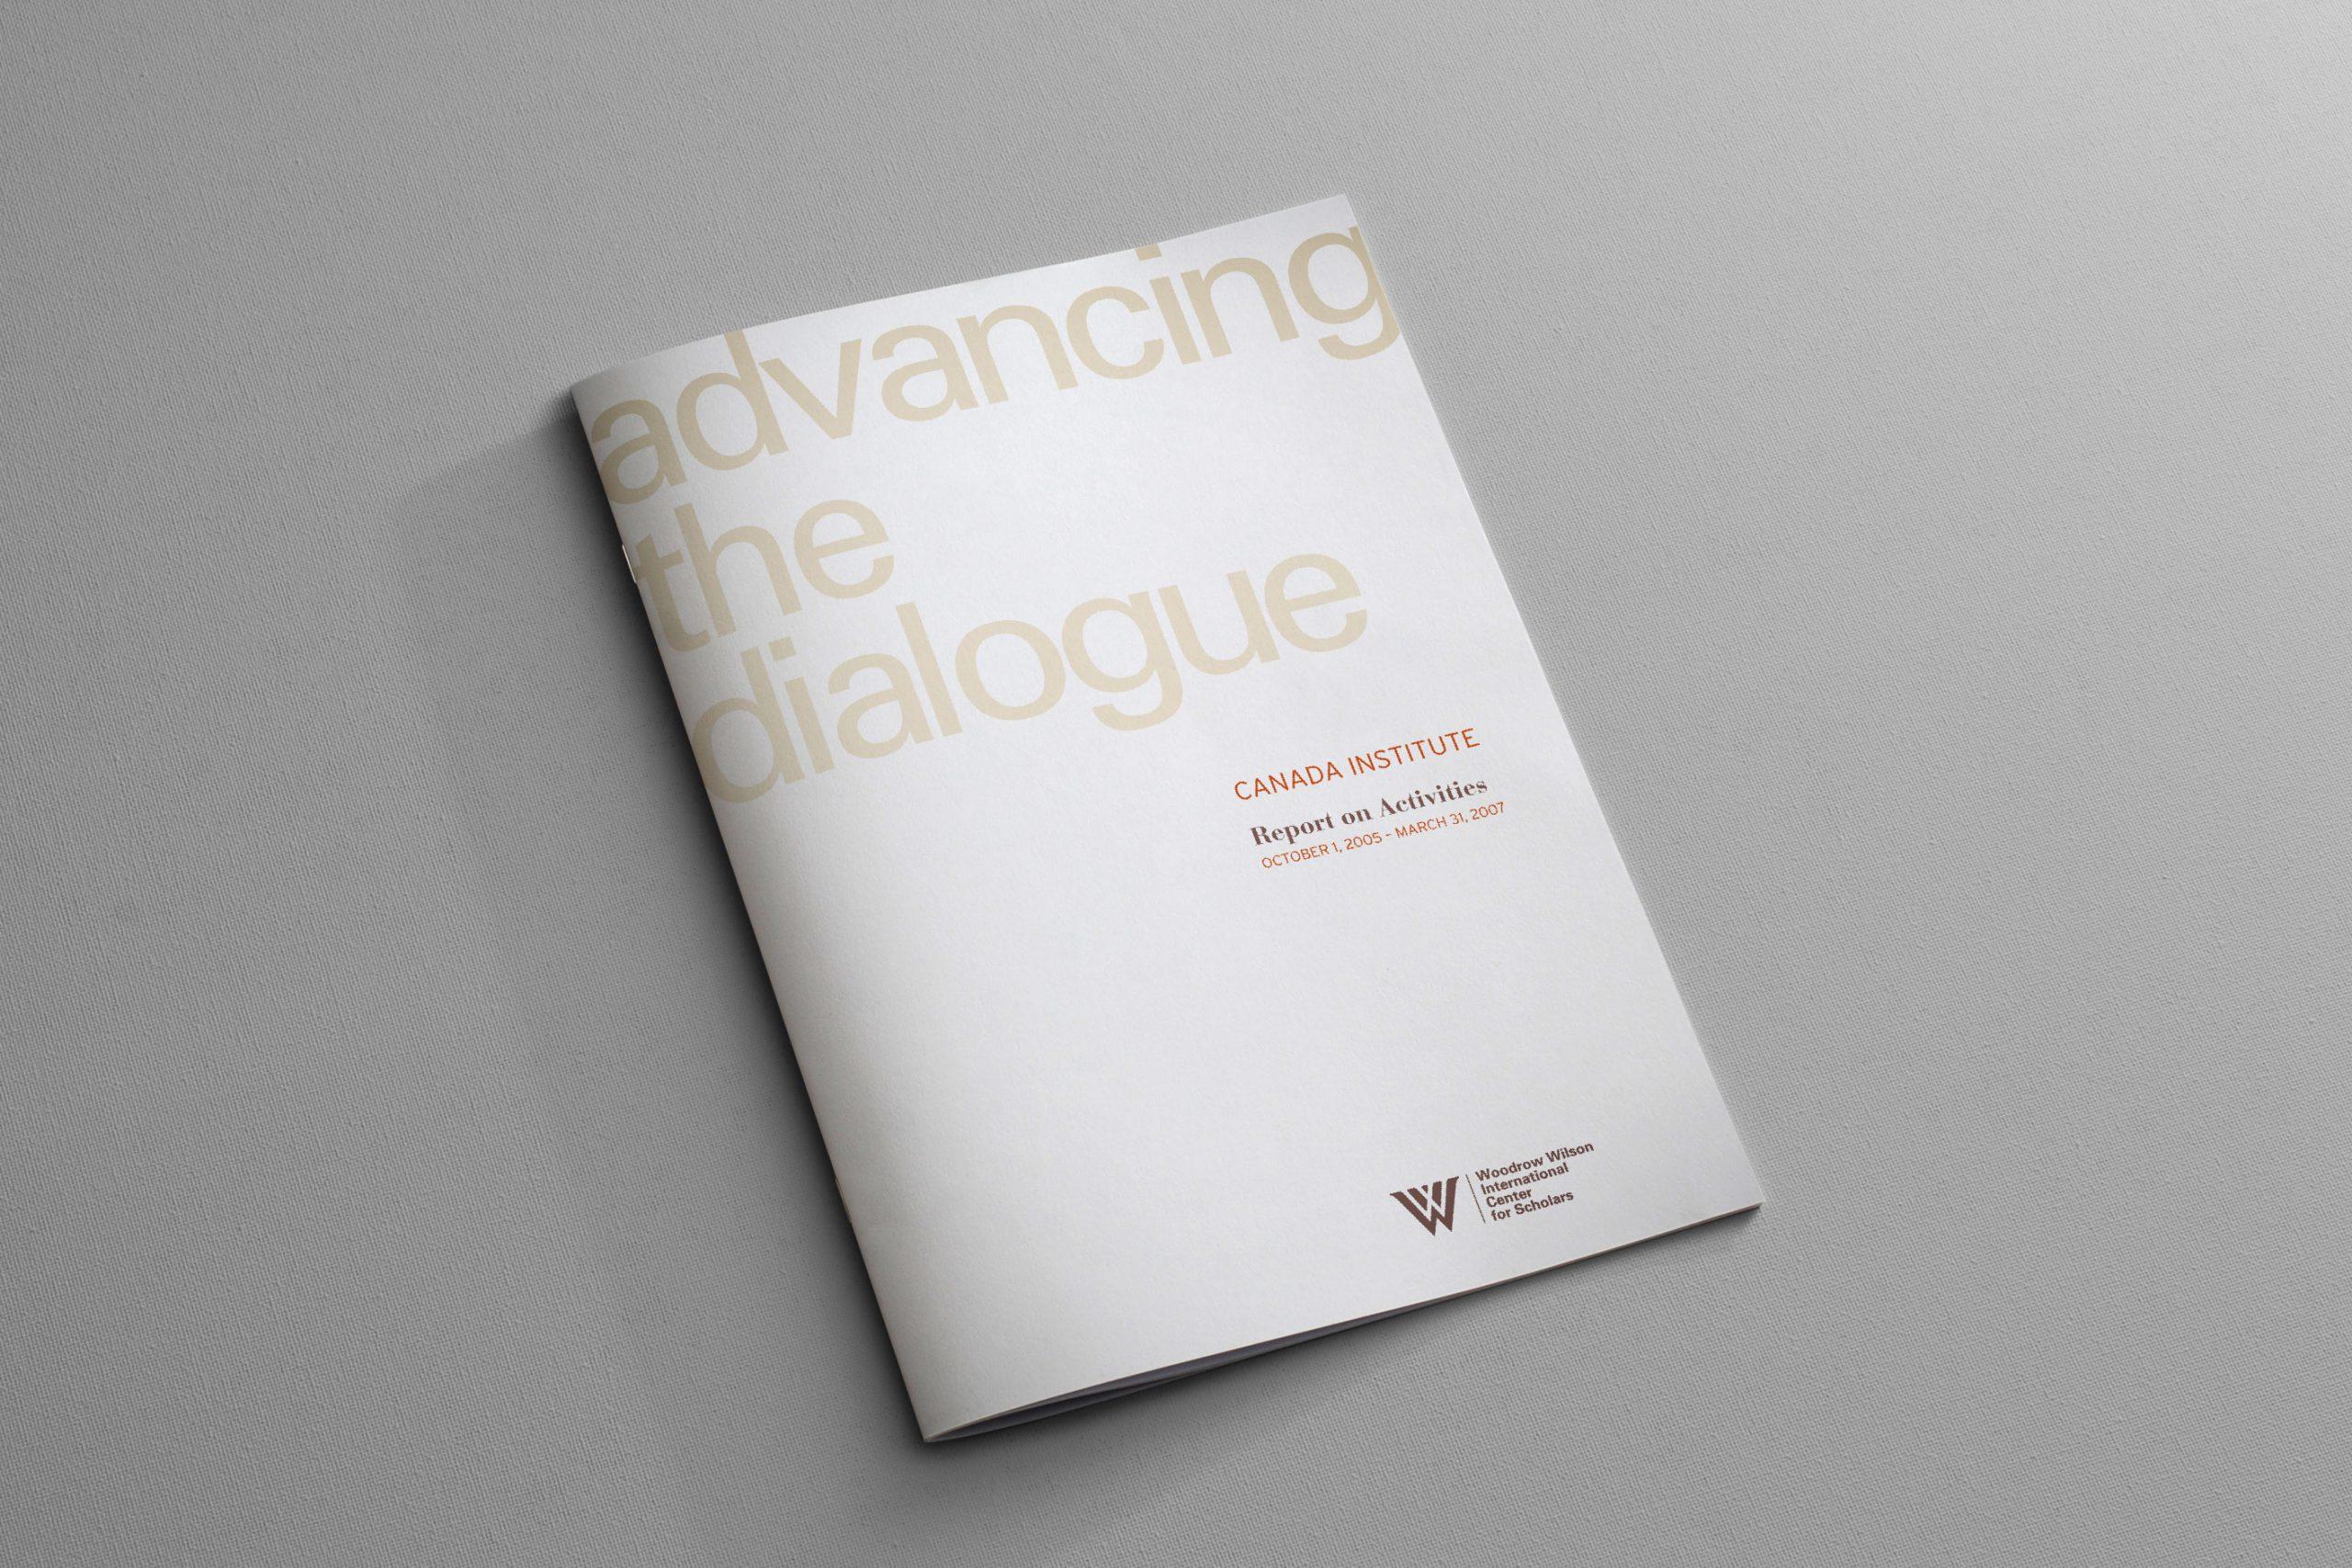 advancingthedialogue-cover